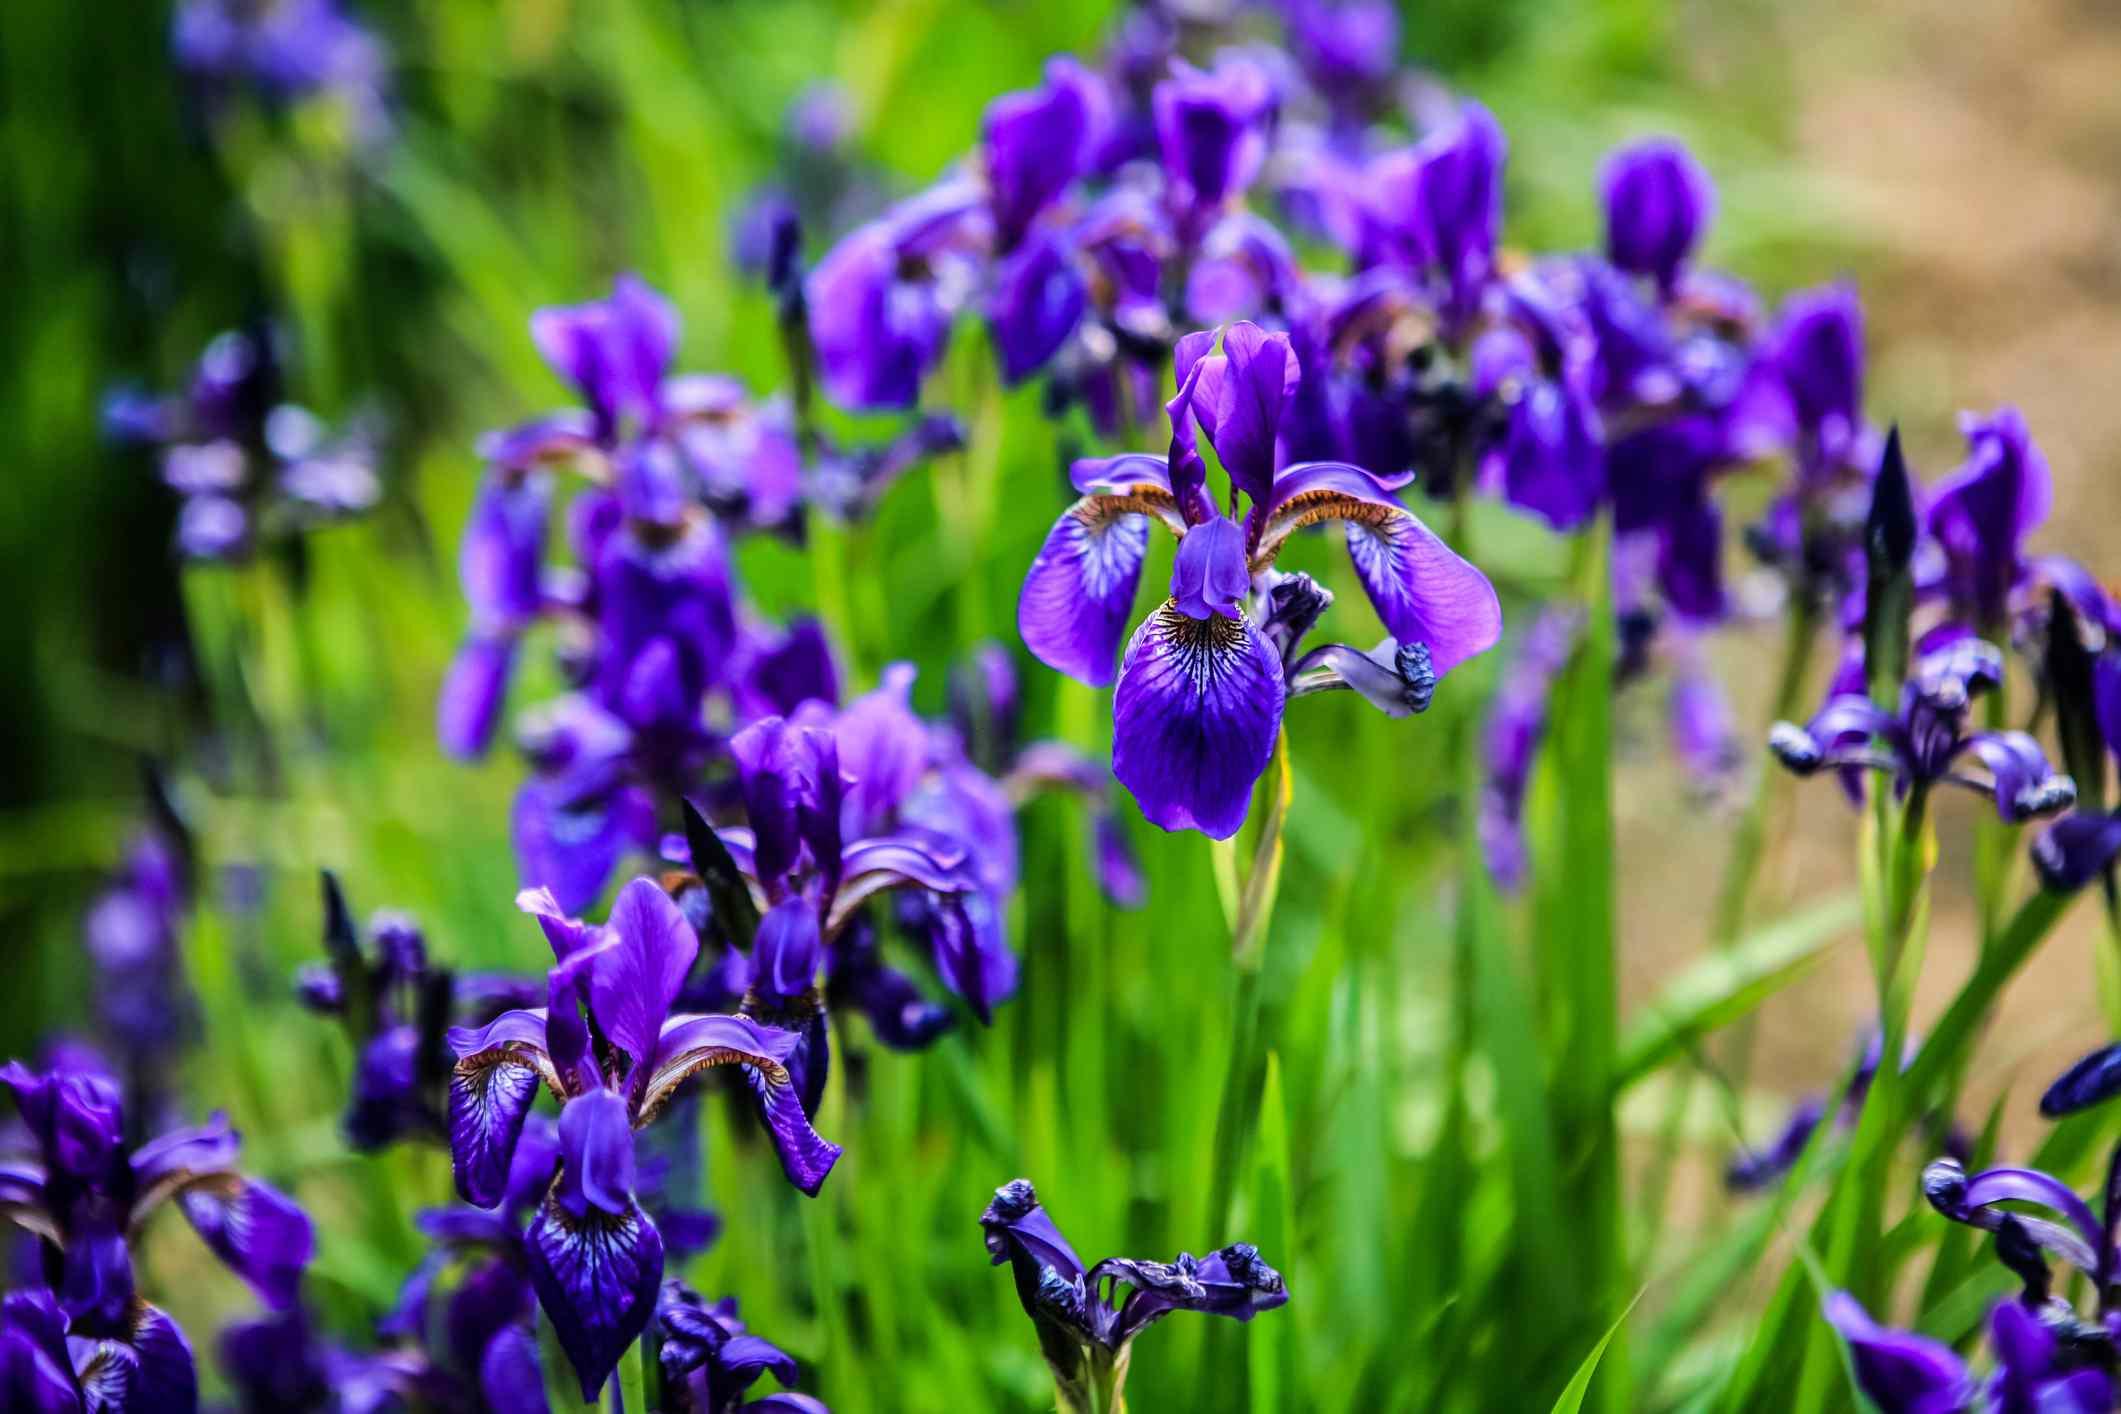 Purple iris blossoms